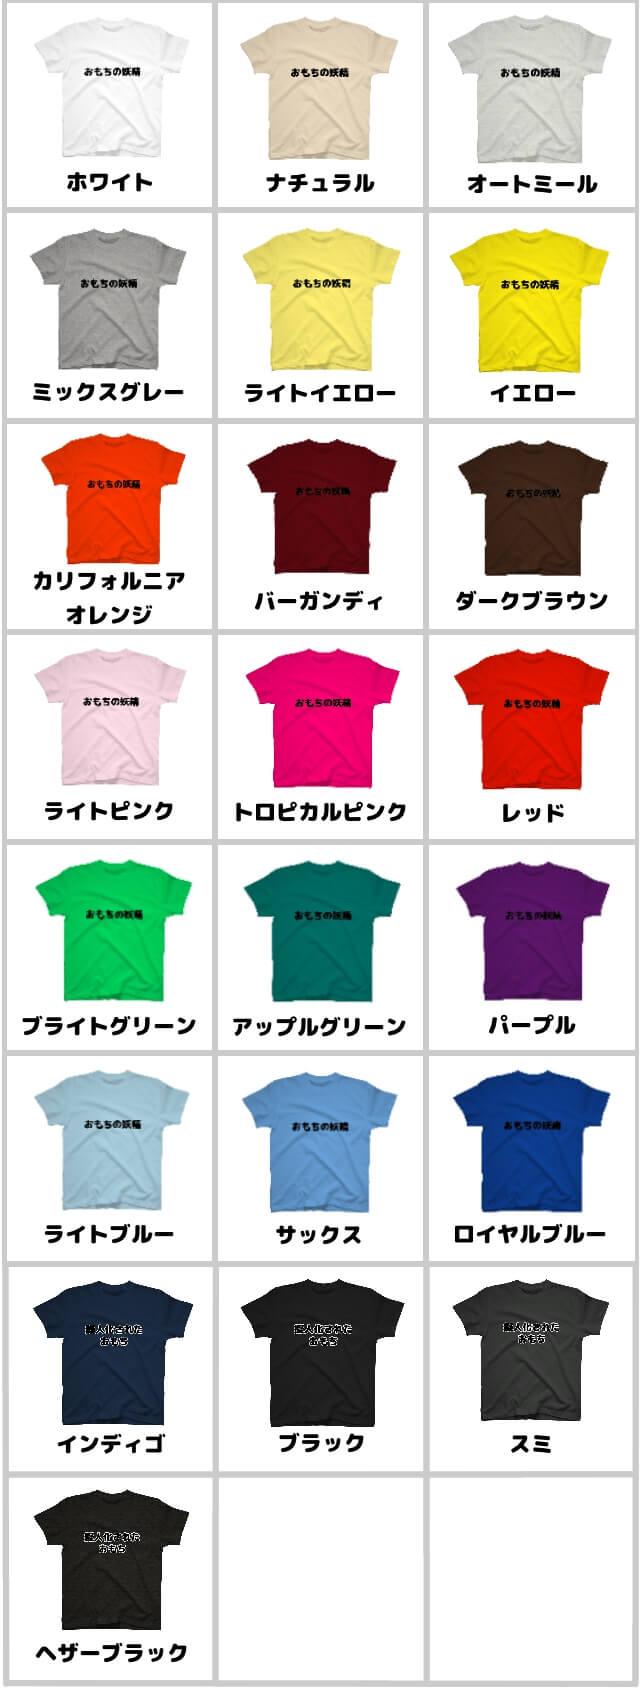 20200526SUZURI-Tシャツ色見本22色